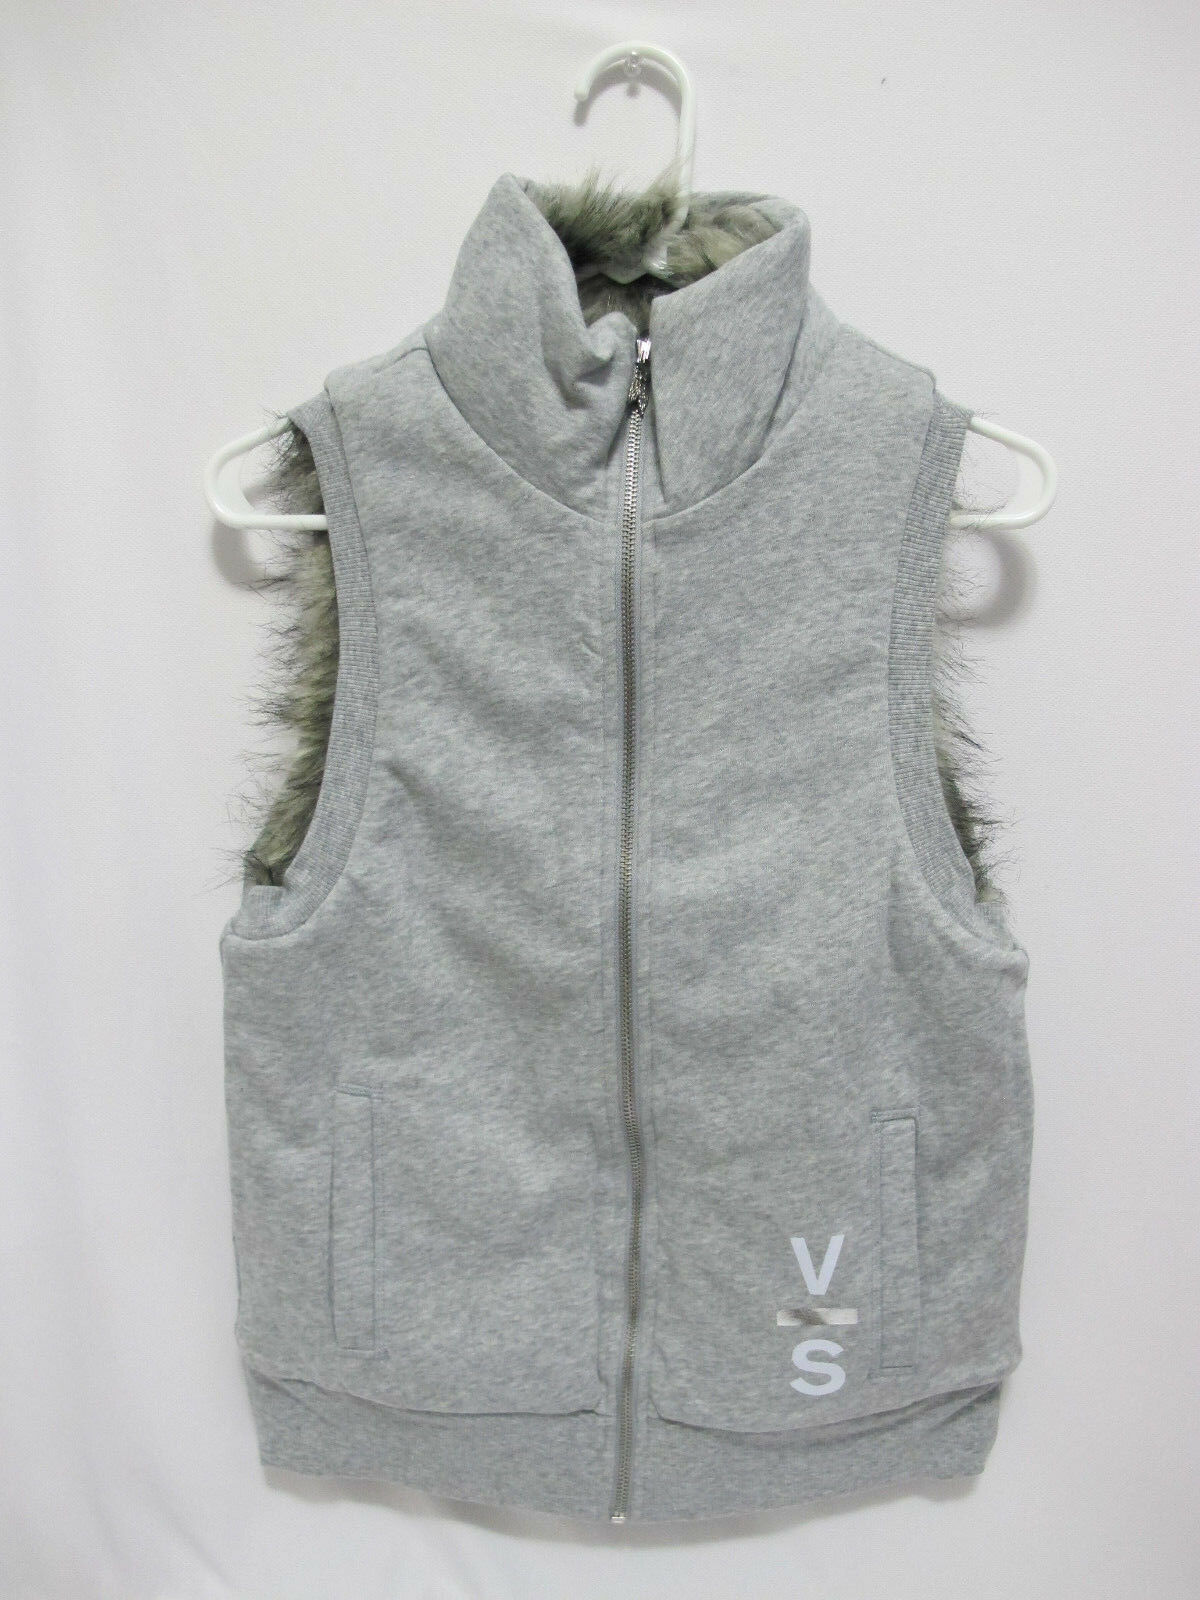 NIP Victoria's Secret Faux Fur Grey Reversible Full Zip Hoodie Vest XS FREE SHIP